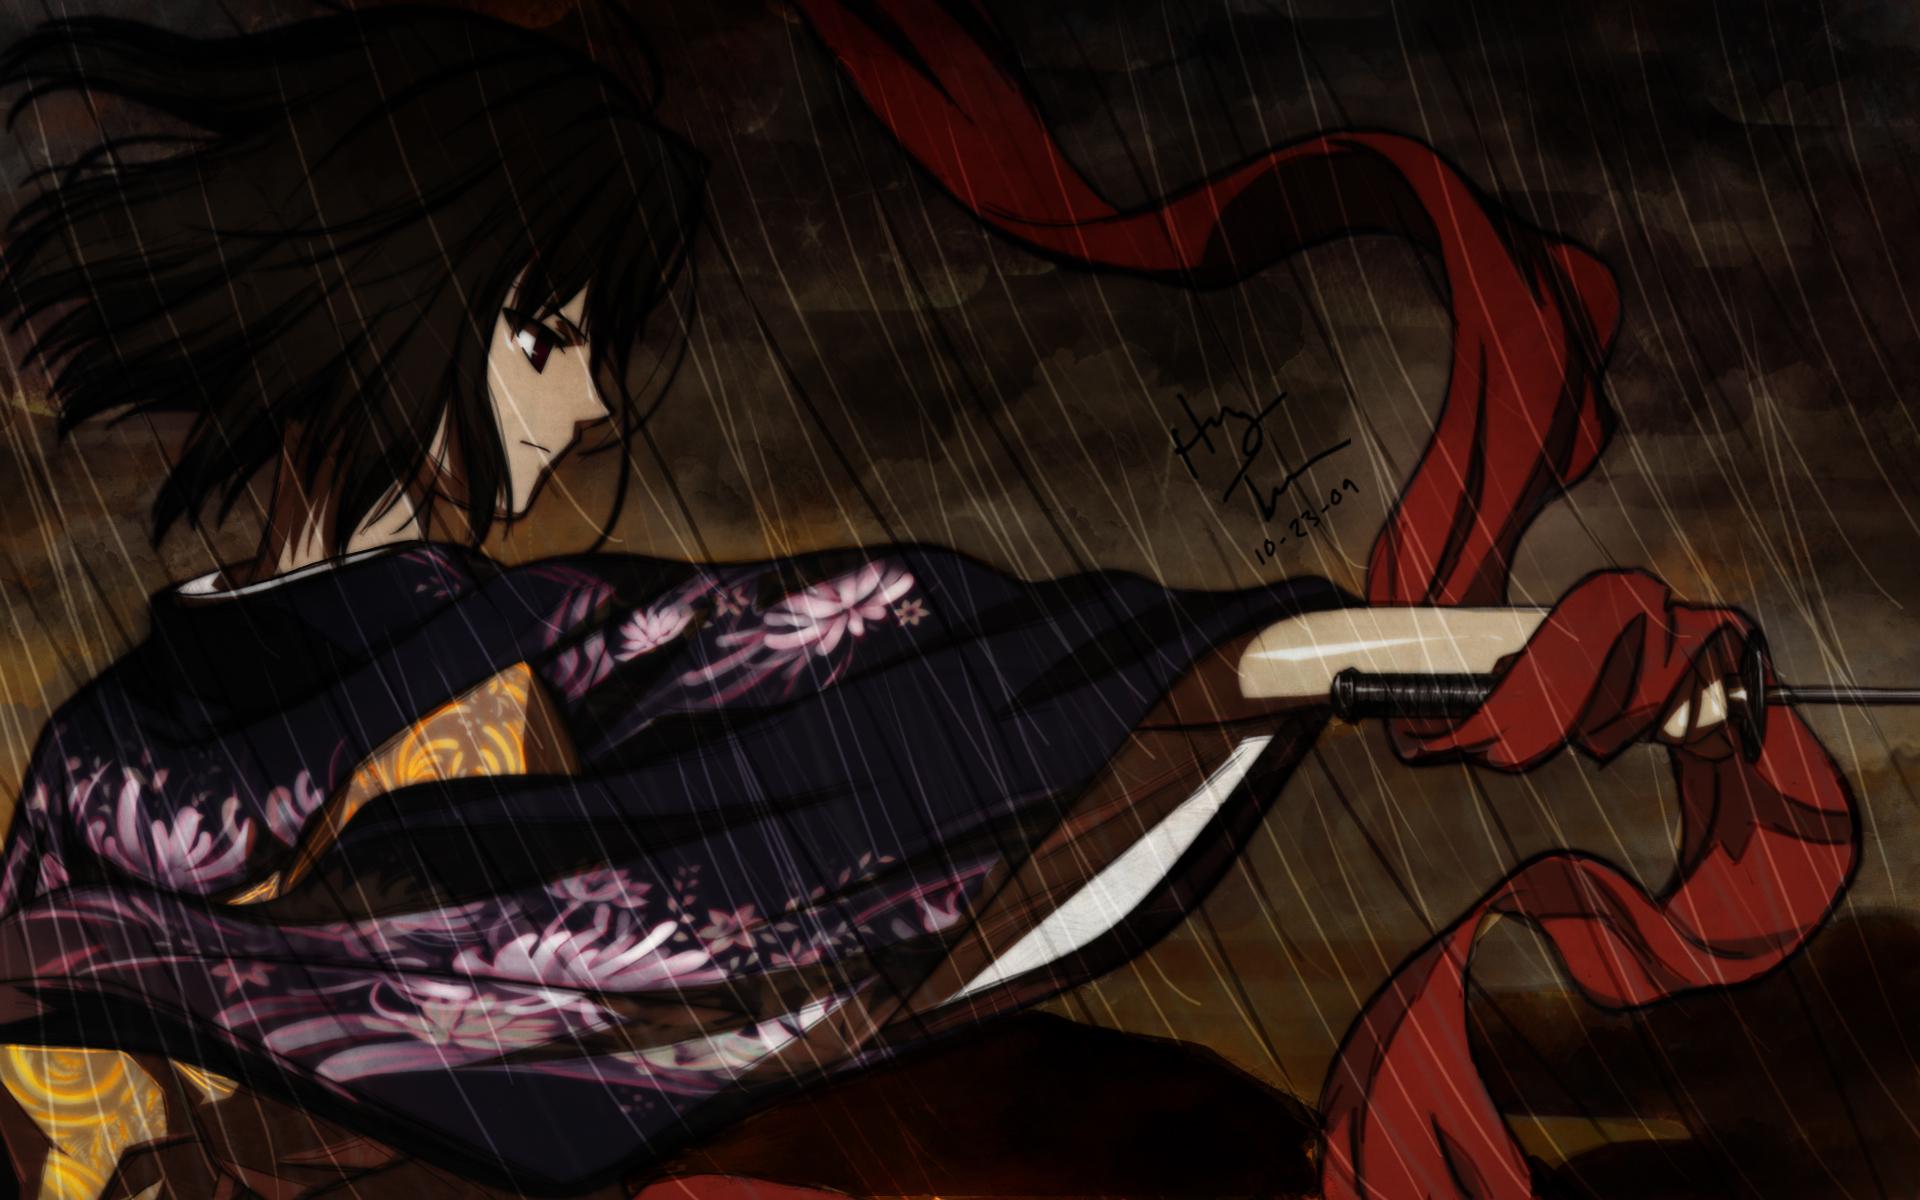 Kara no Kyoukai Anime Wallpaper # 1